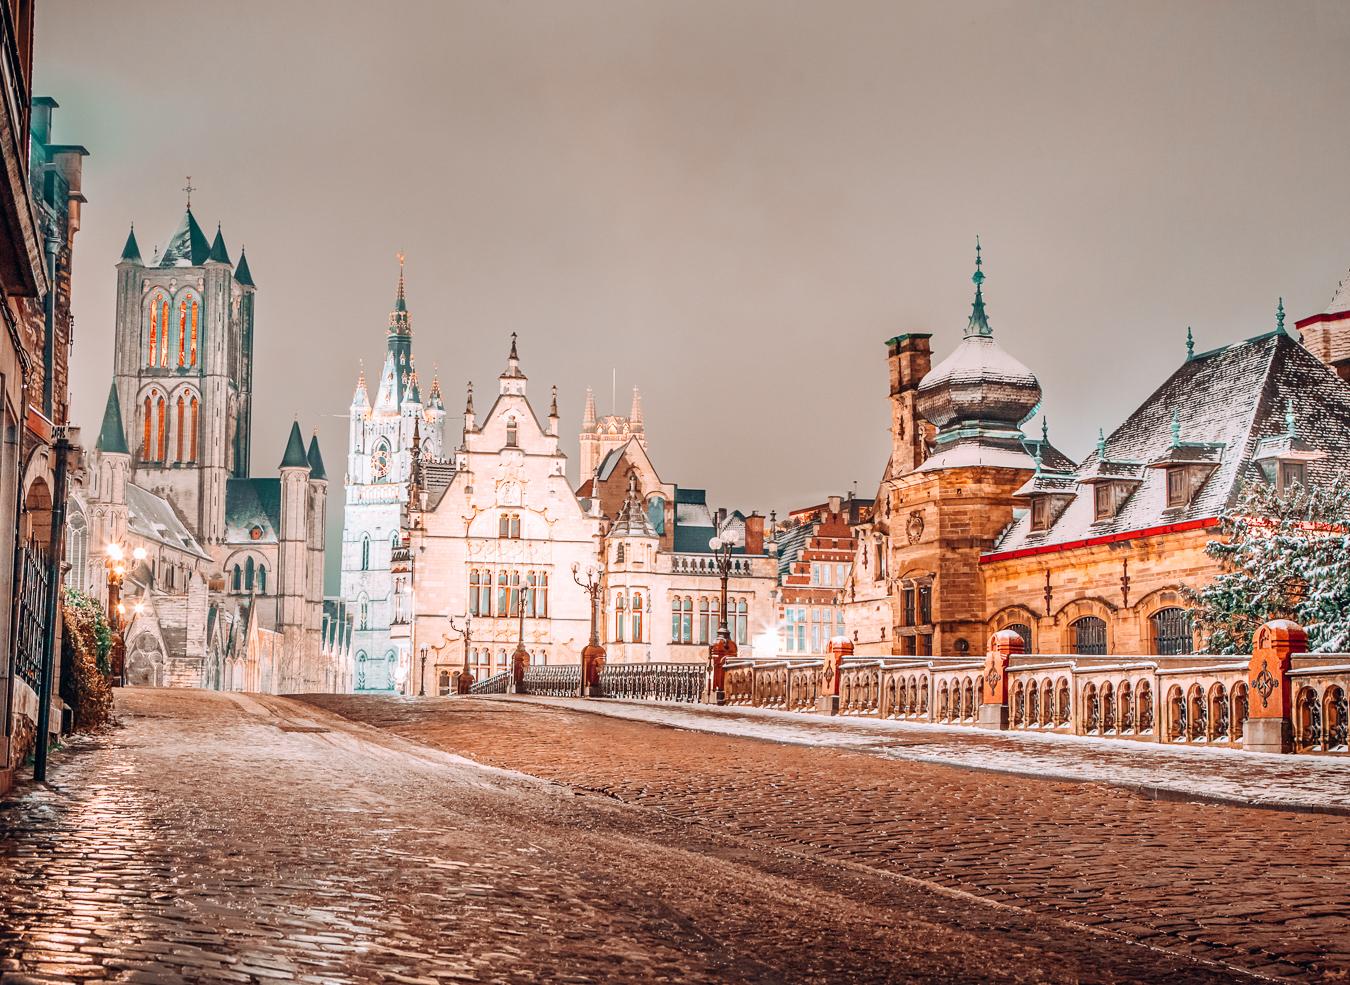 Buildings at night during winter in Belgium